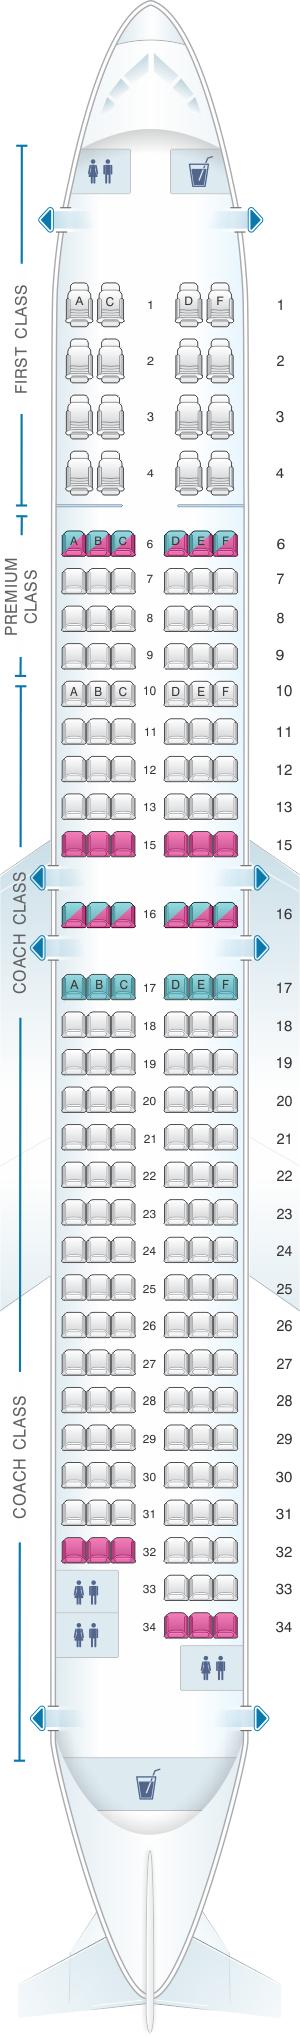 Seat map for Alaska Airlines - Horizon Air Boeing B737 900